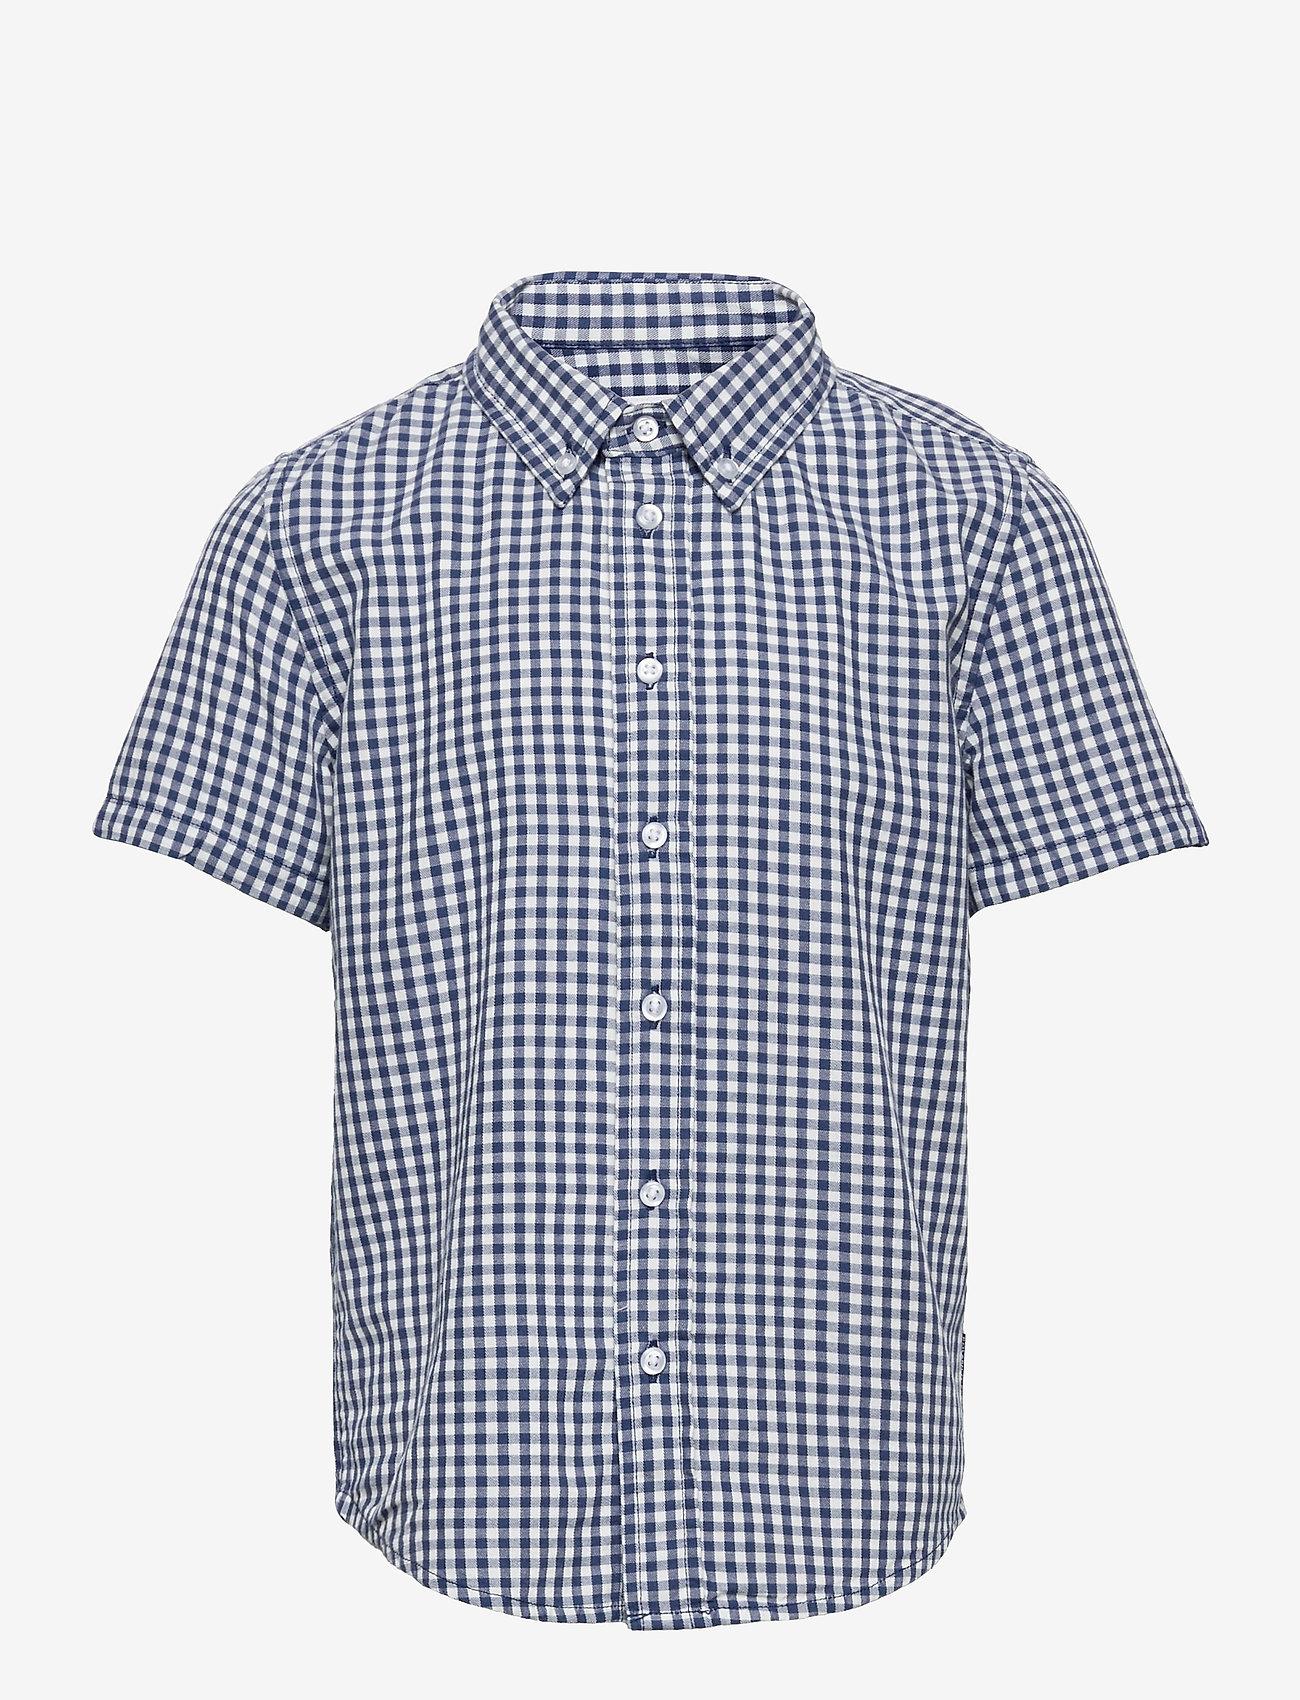 Polarn O. Pyret - Shirt checked s/s School - shirts - ensign blue - 0